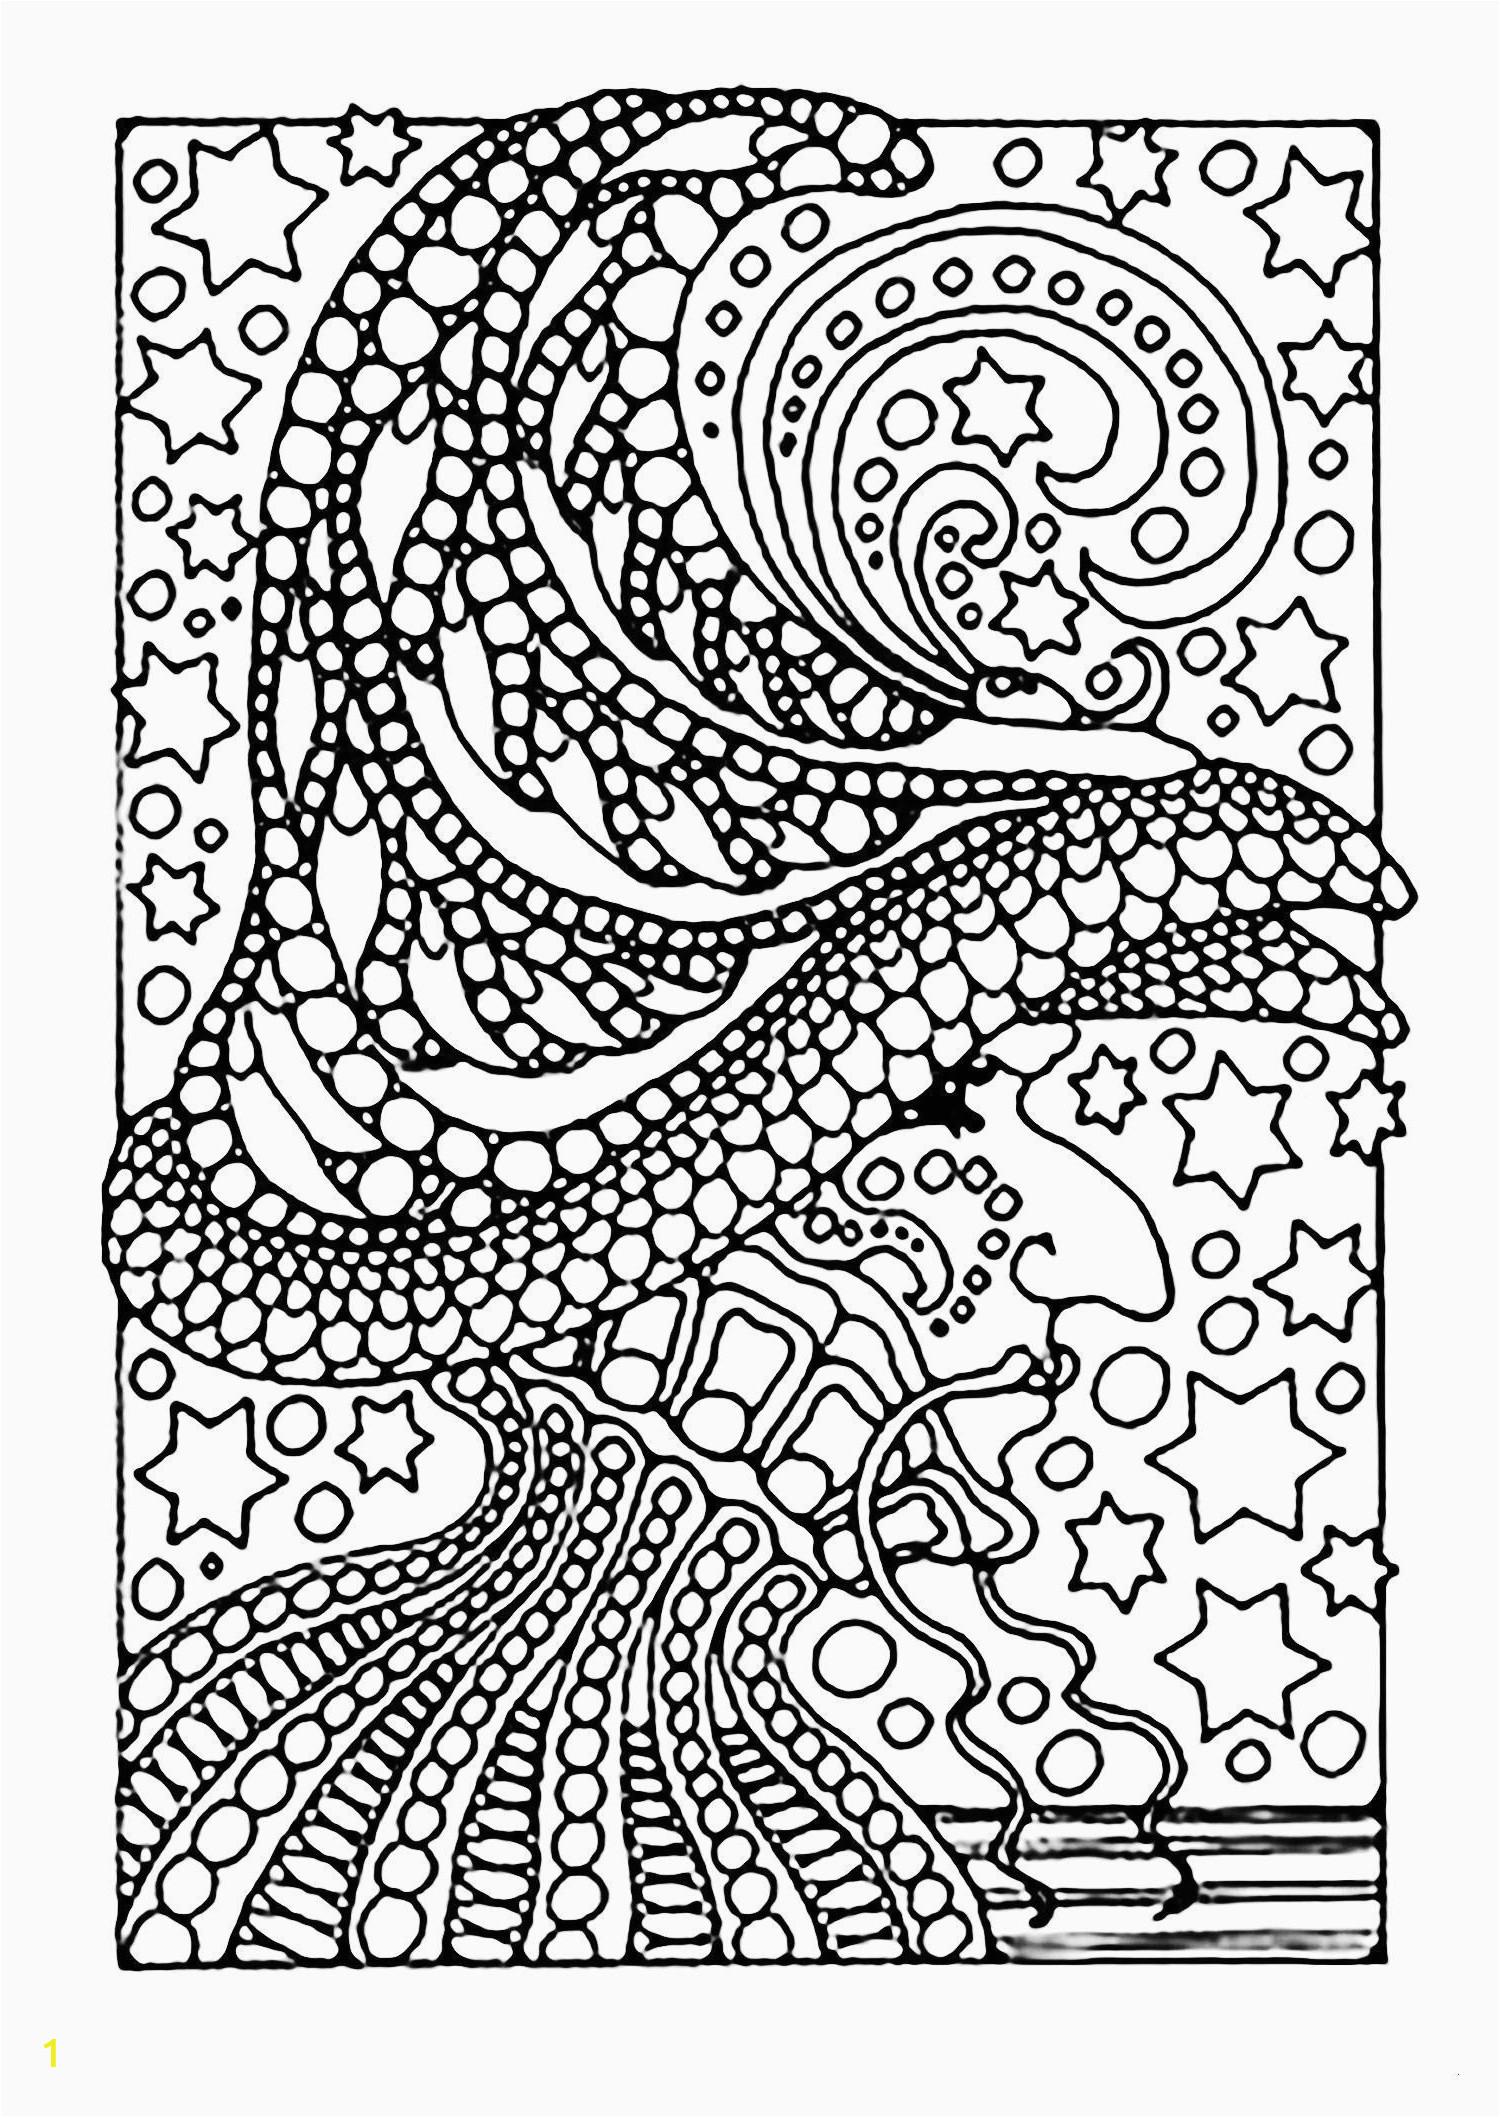 printable mandala coloring sheet new image giraffe mandala coloring pages of printable mandala coloring sheet